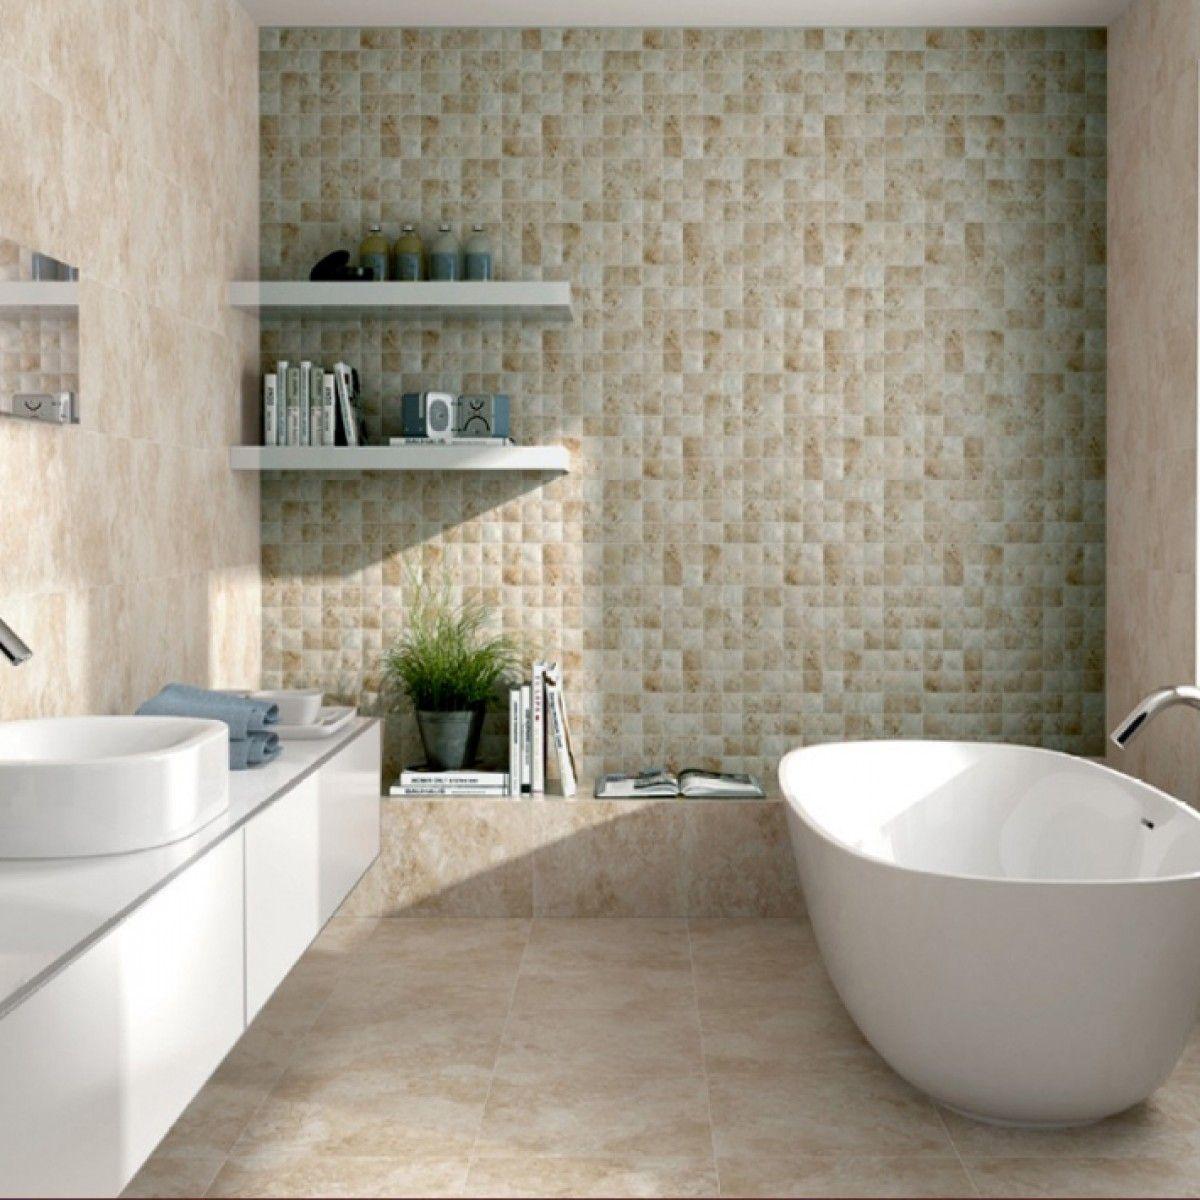 45x45 Tivoli Marfil Tiles Tile Bathroom Classic Bathroom Tile Floor